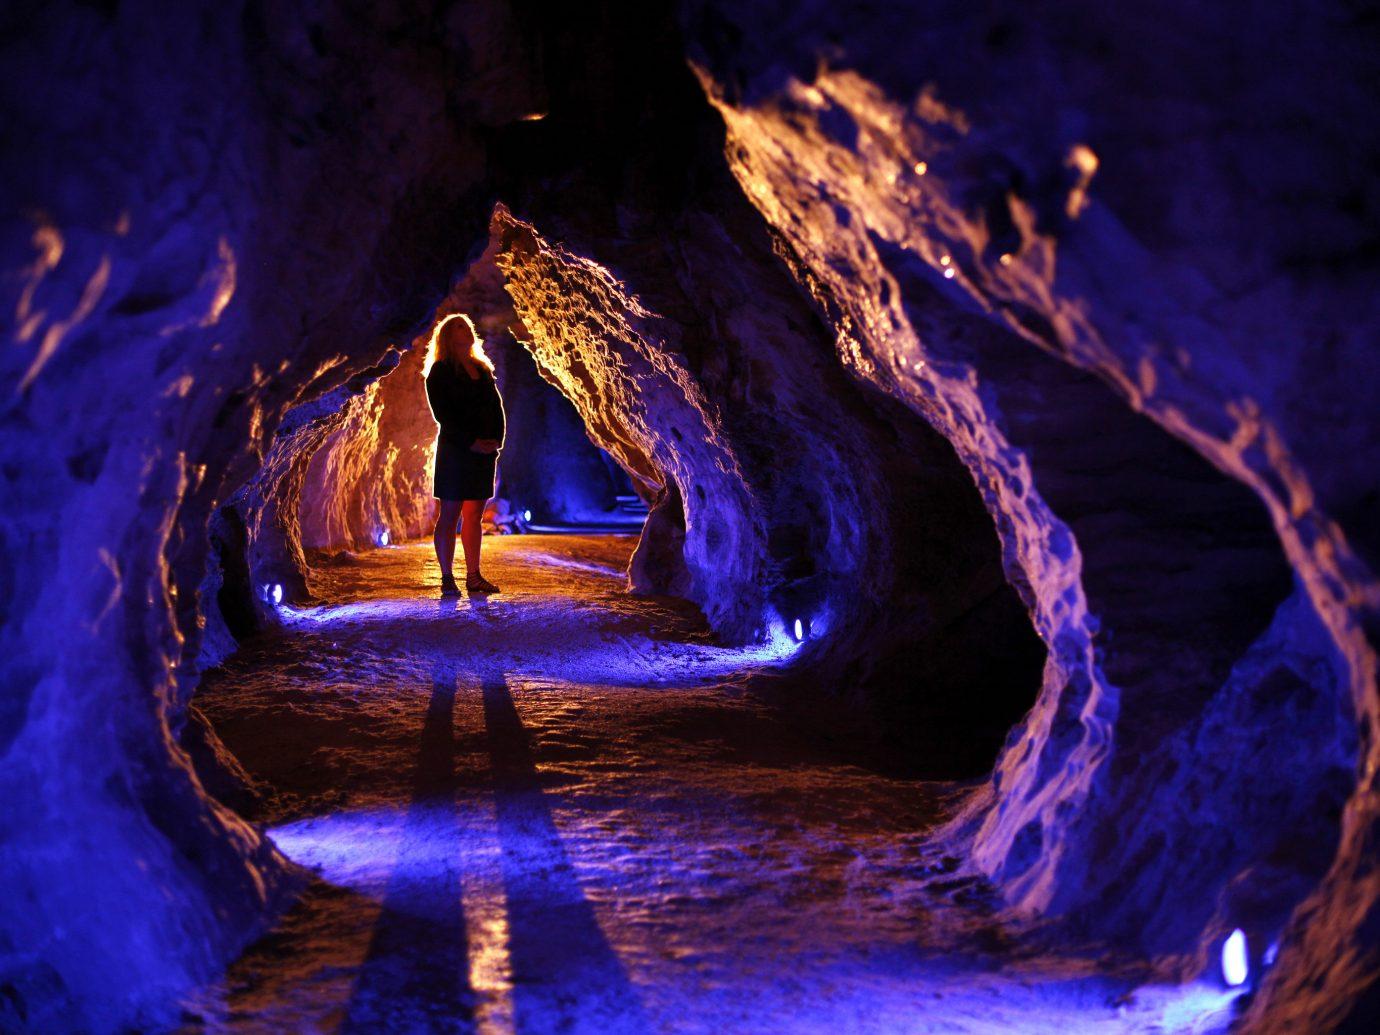 Offbeat landform cave Nature night light geological phenomenon reflection darkness dark formation